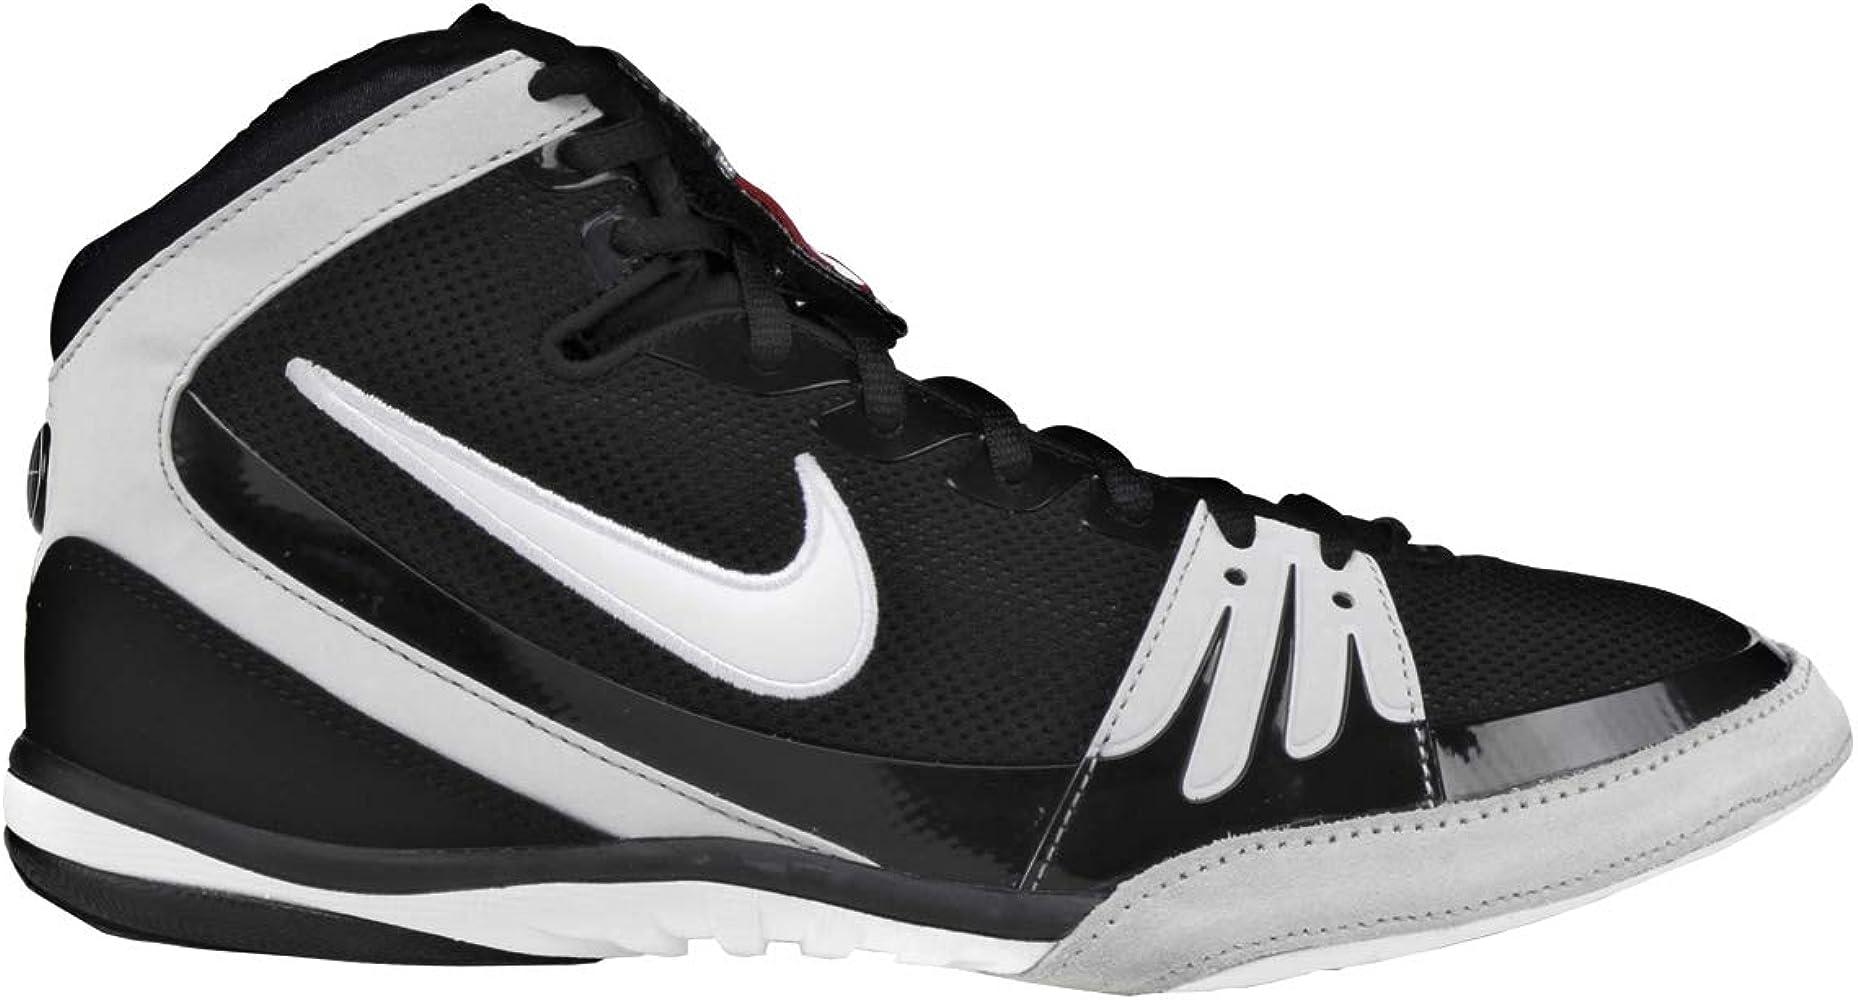 Nike Freek wrestling shoes Black White